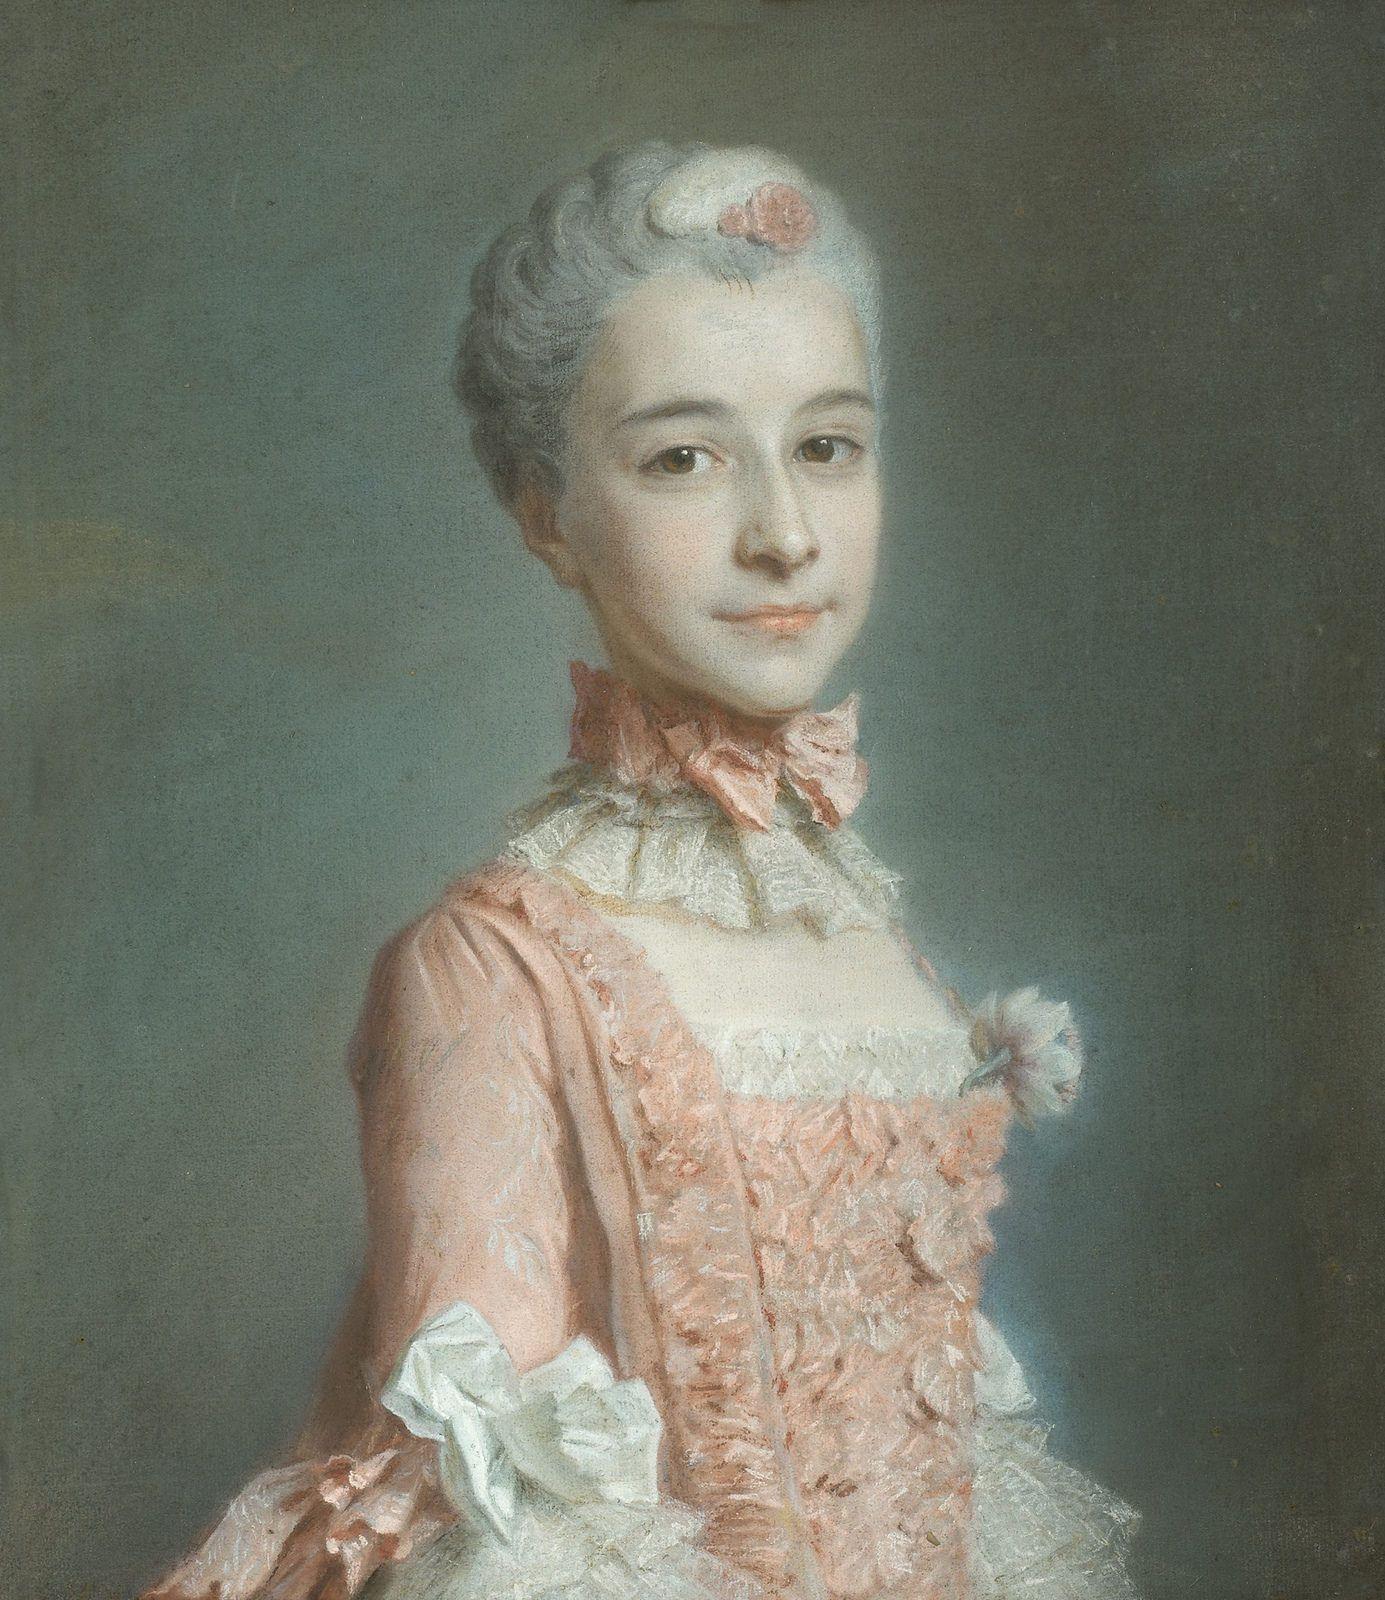 Billedresultat for 18th century portrait pink clothes